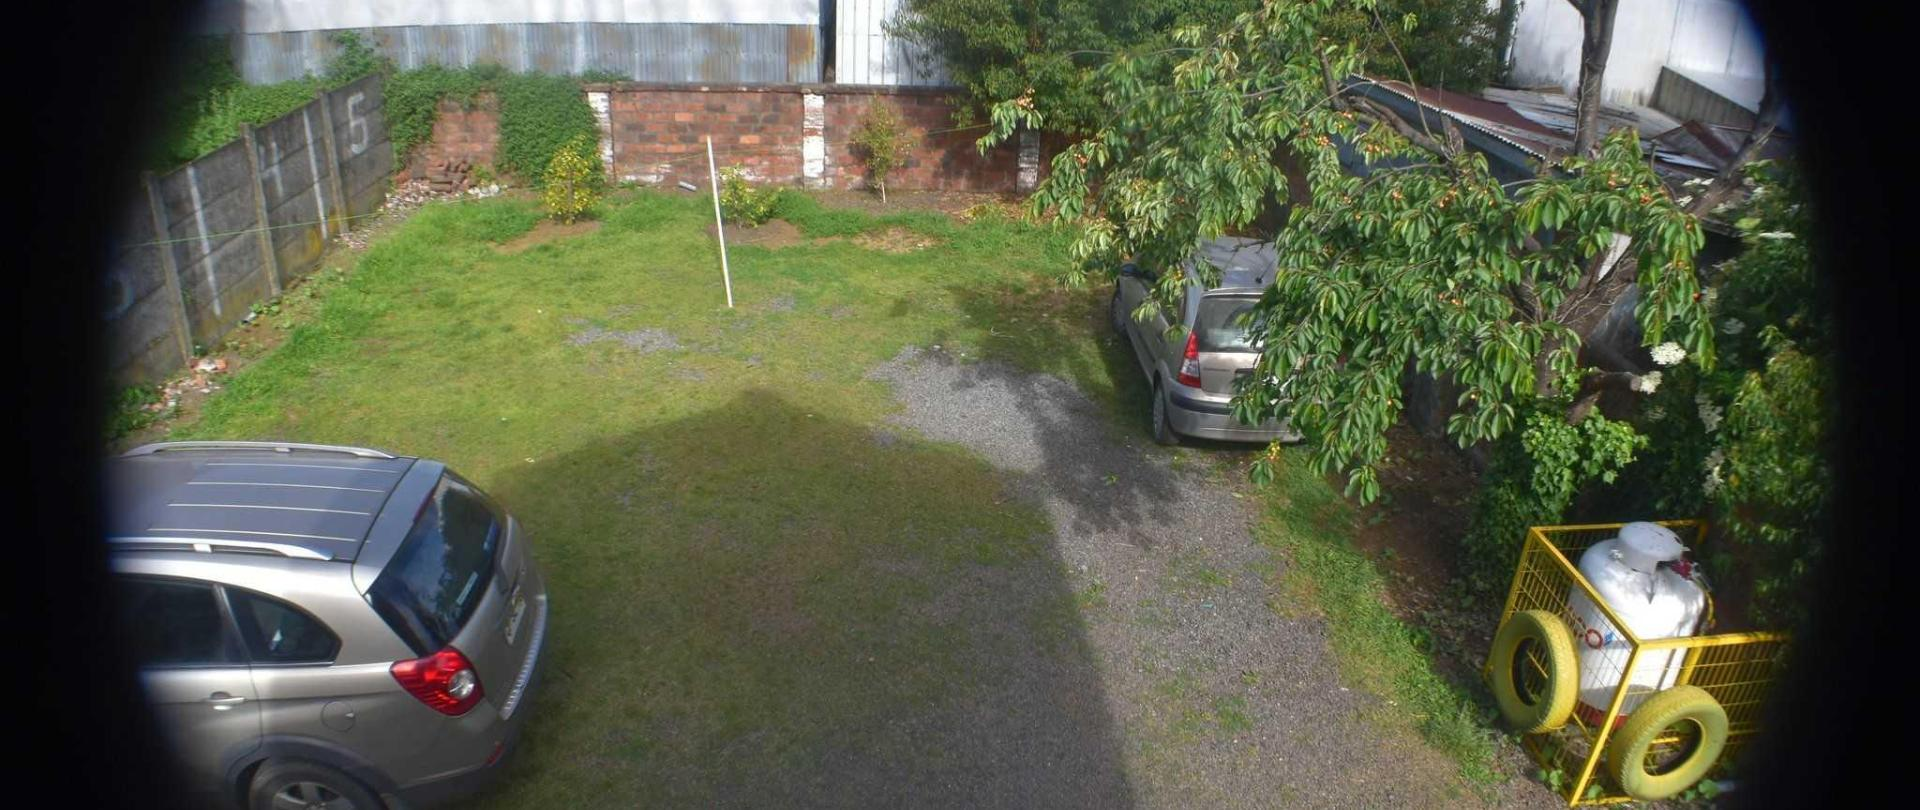 estacionamiento_arriba.JPG